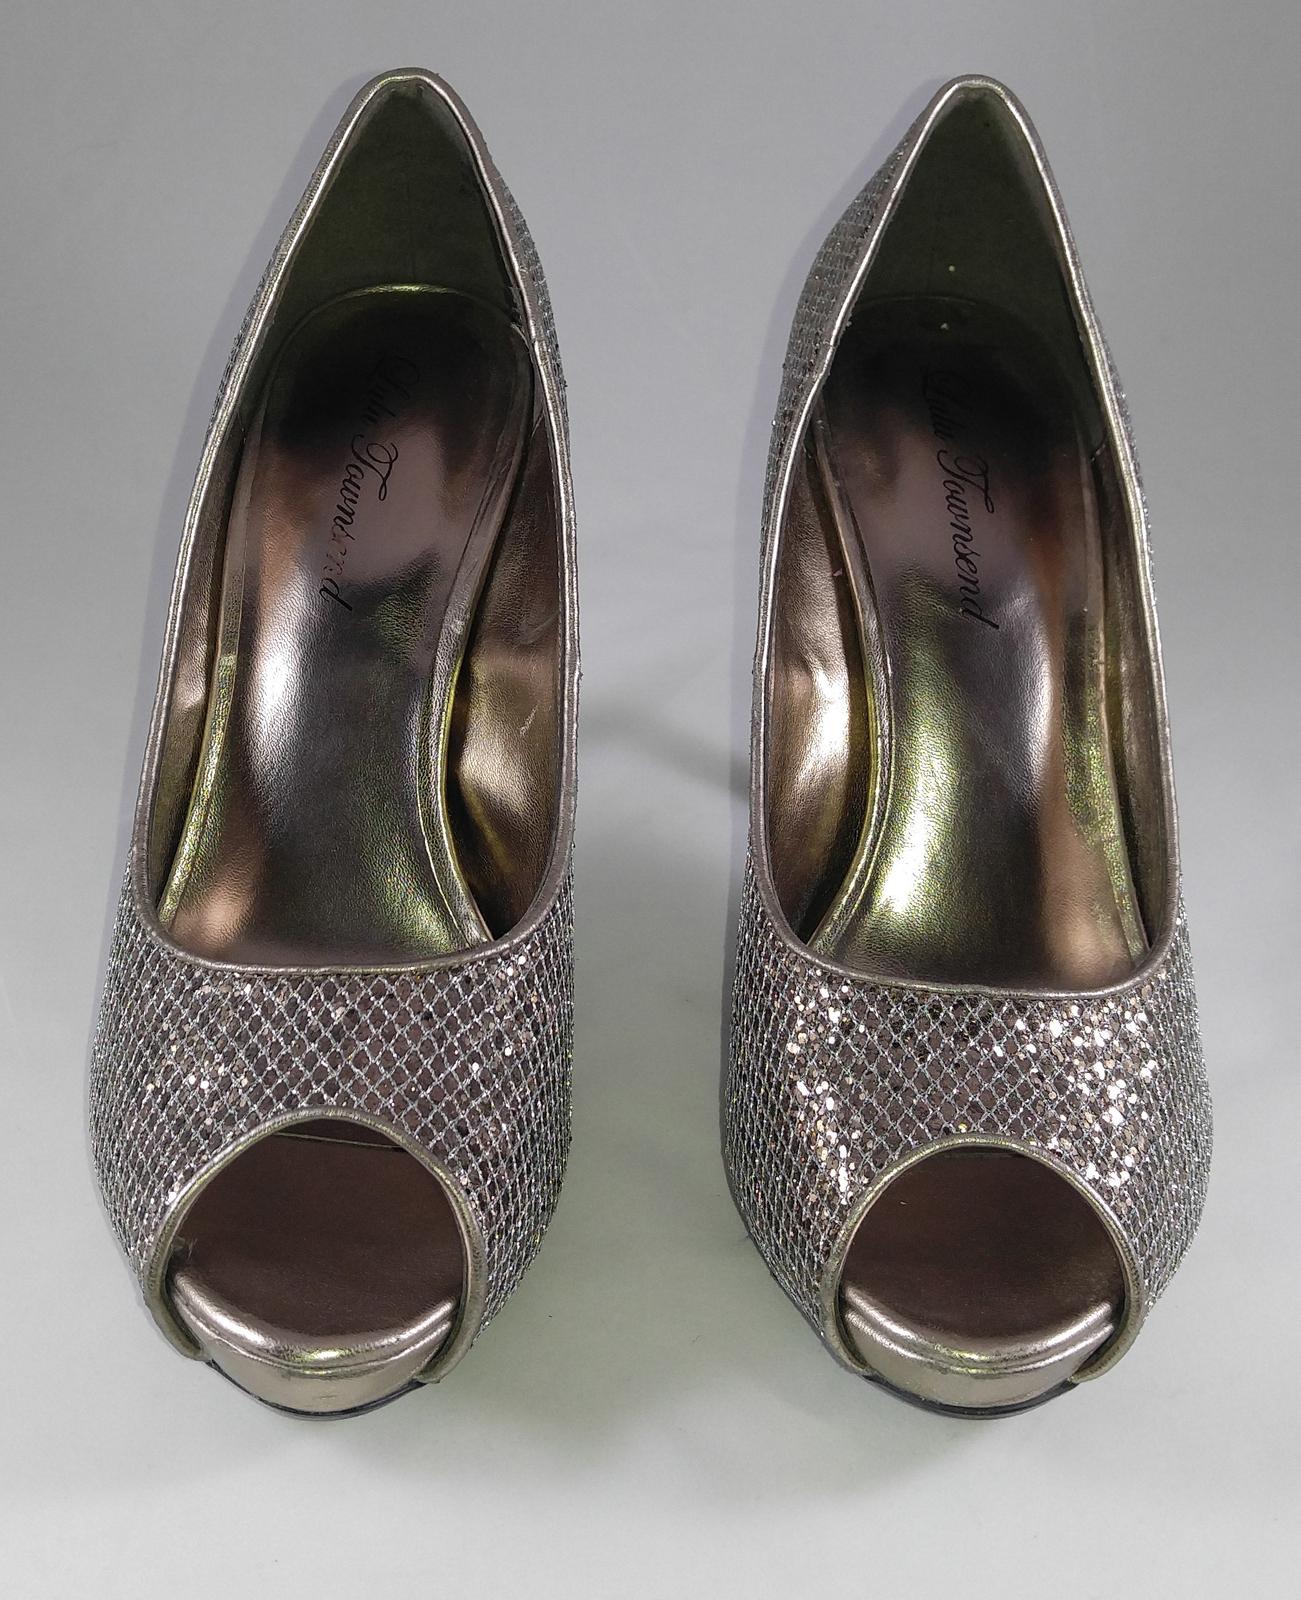 Sparkling Silver Lulu Townsend Stiletto Heels Open Toe Shoes Pumps Size 8.5